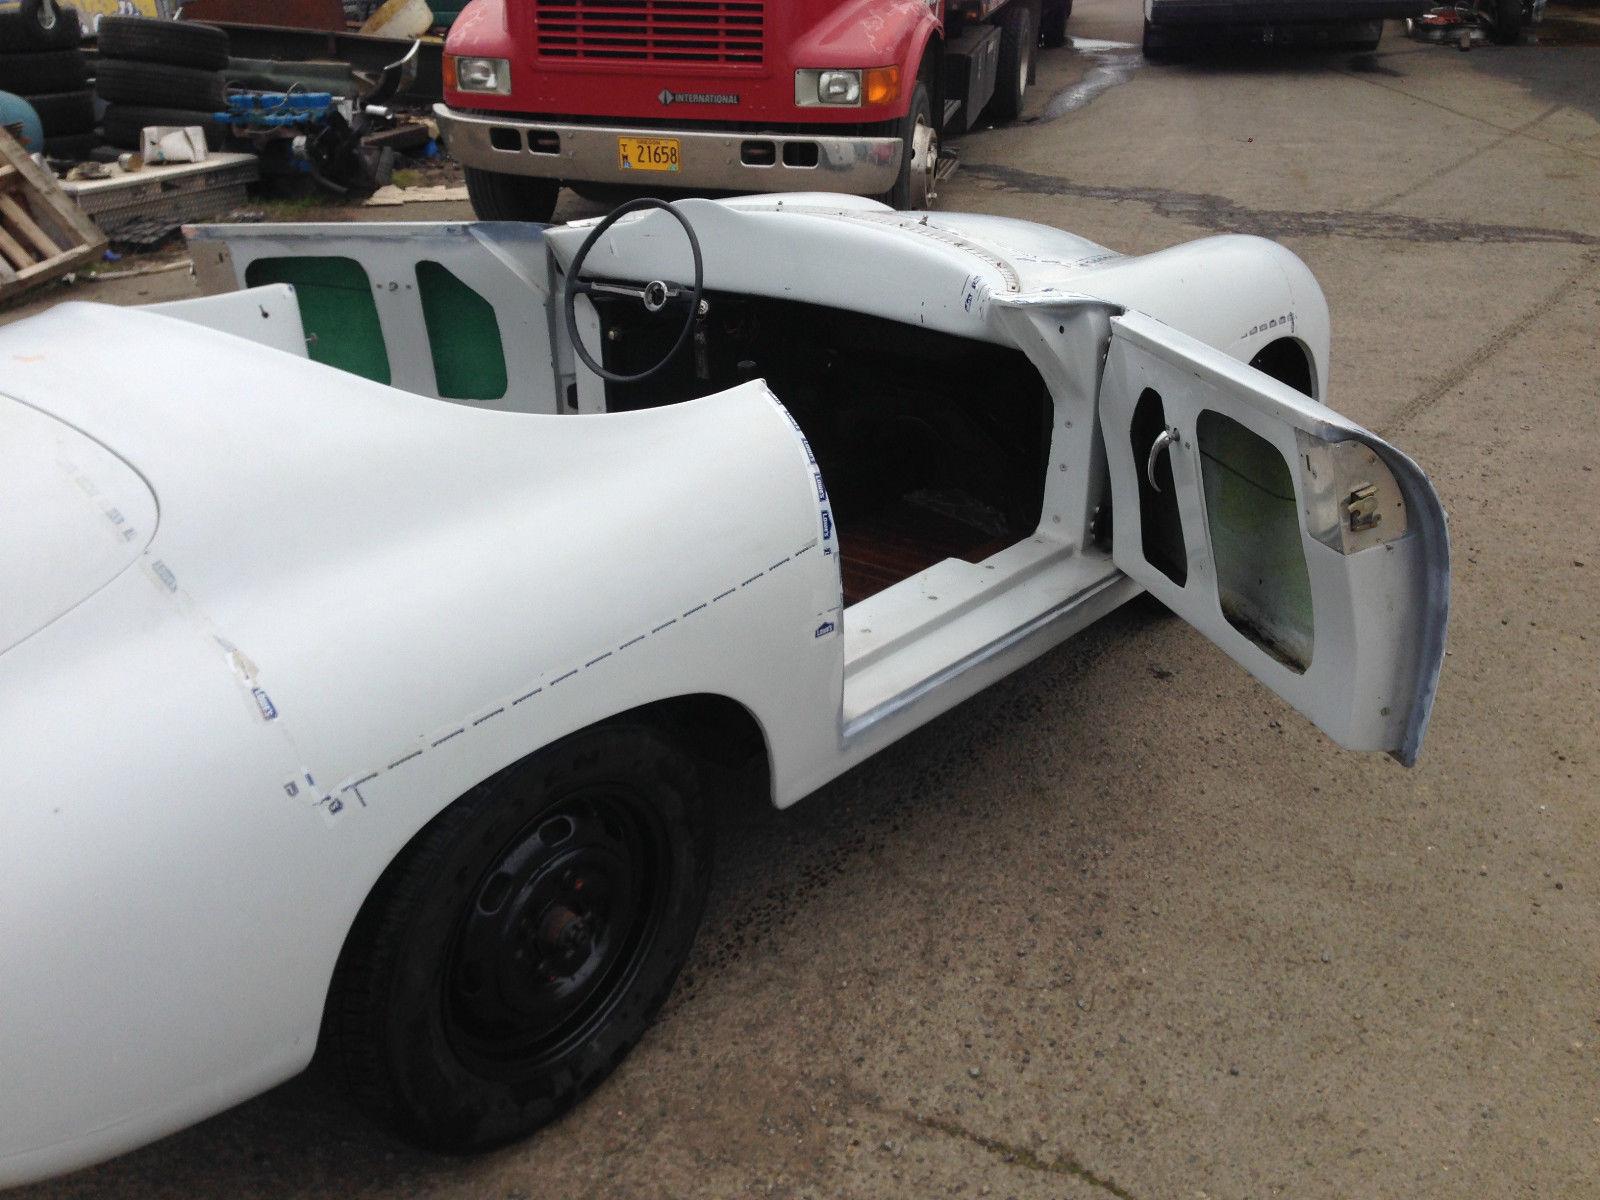 1956 356 Porsche Replica Kit Car For Sale In Medford